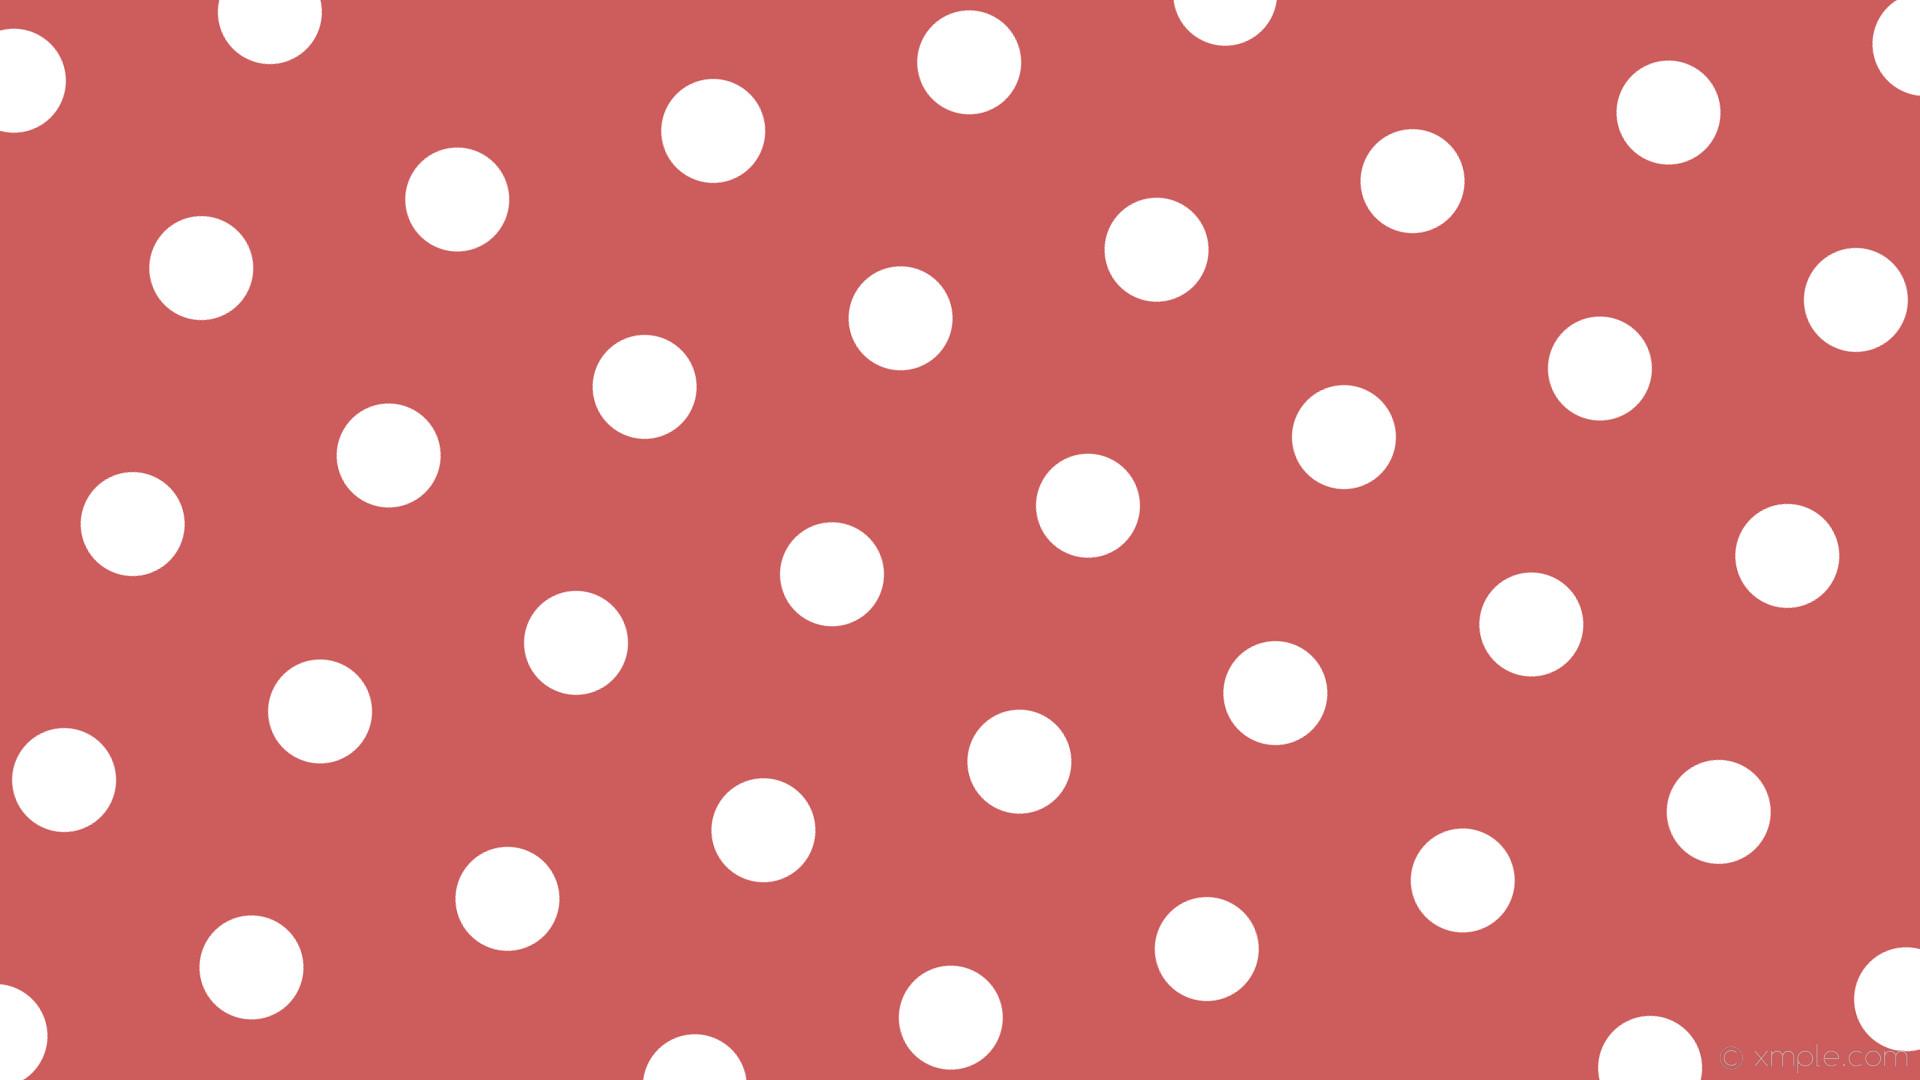 wallpaper polka dots red hexagon white indian red #cd5c5c #ffffff diagonal  15° 104px